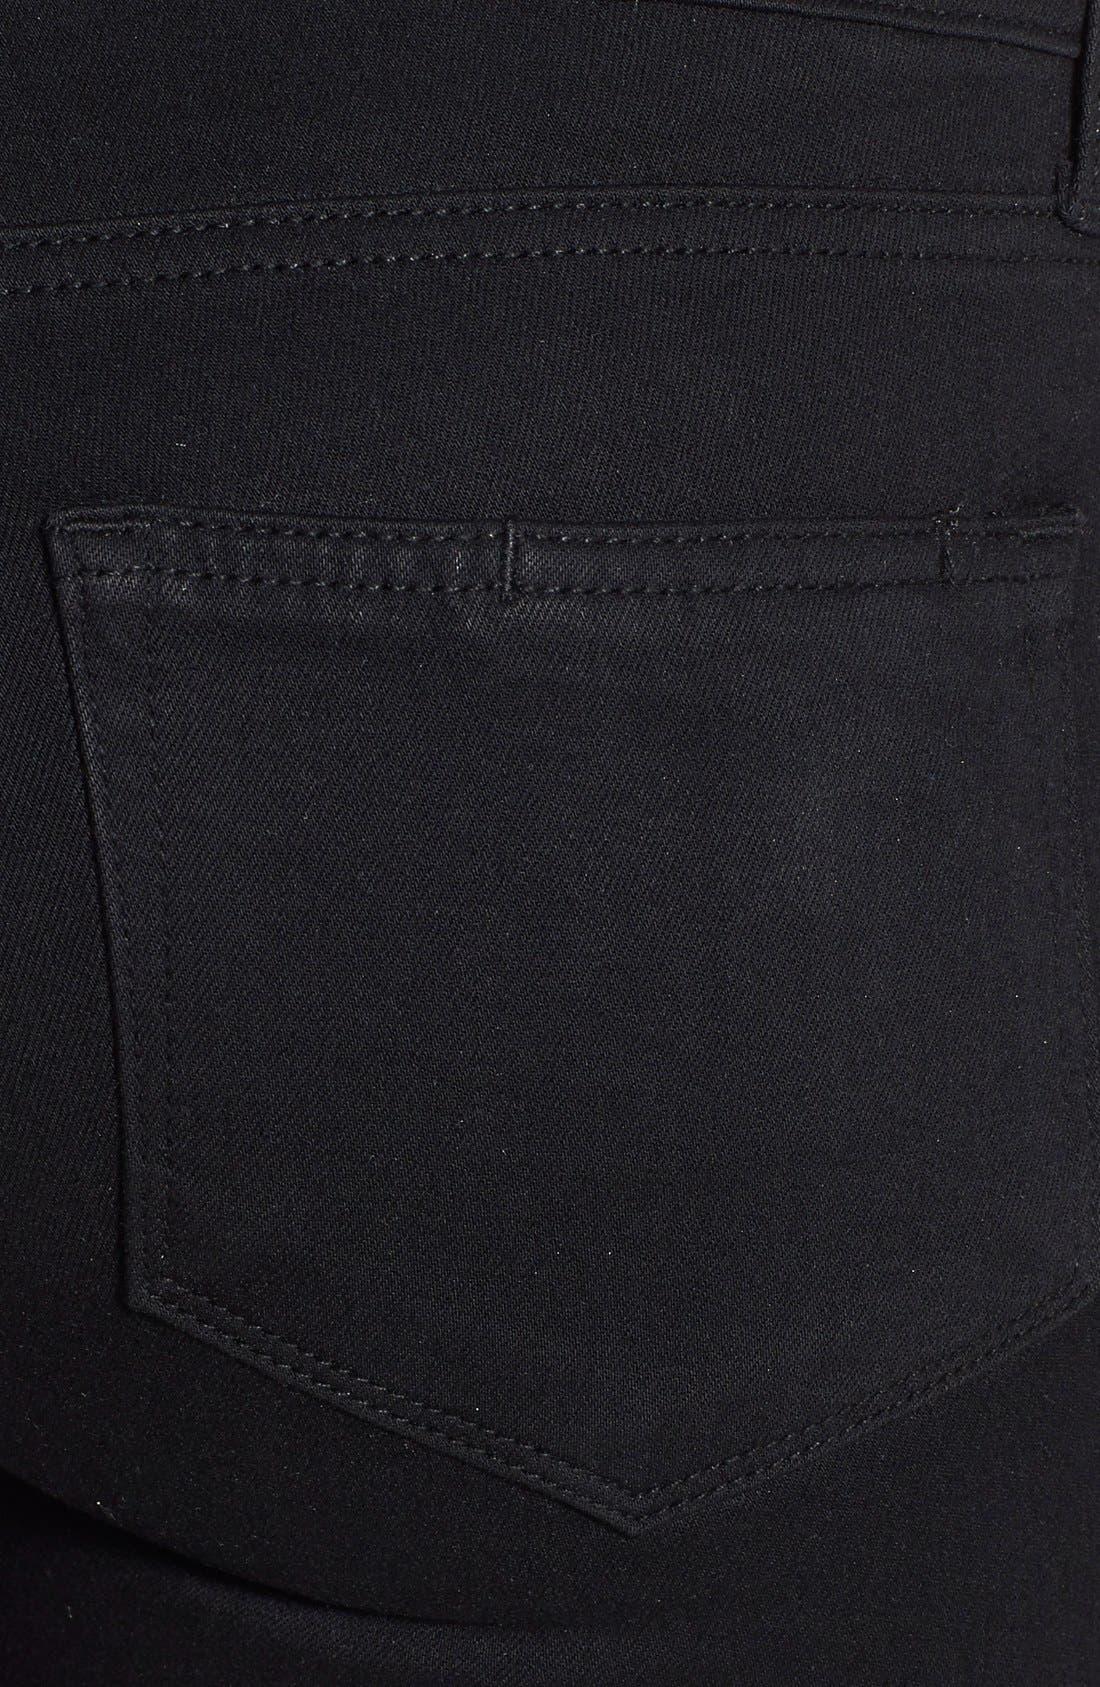 Alternate Image 3  - PAIGE Transcend - Skyline Skinny Jeans (Black Shadow)